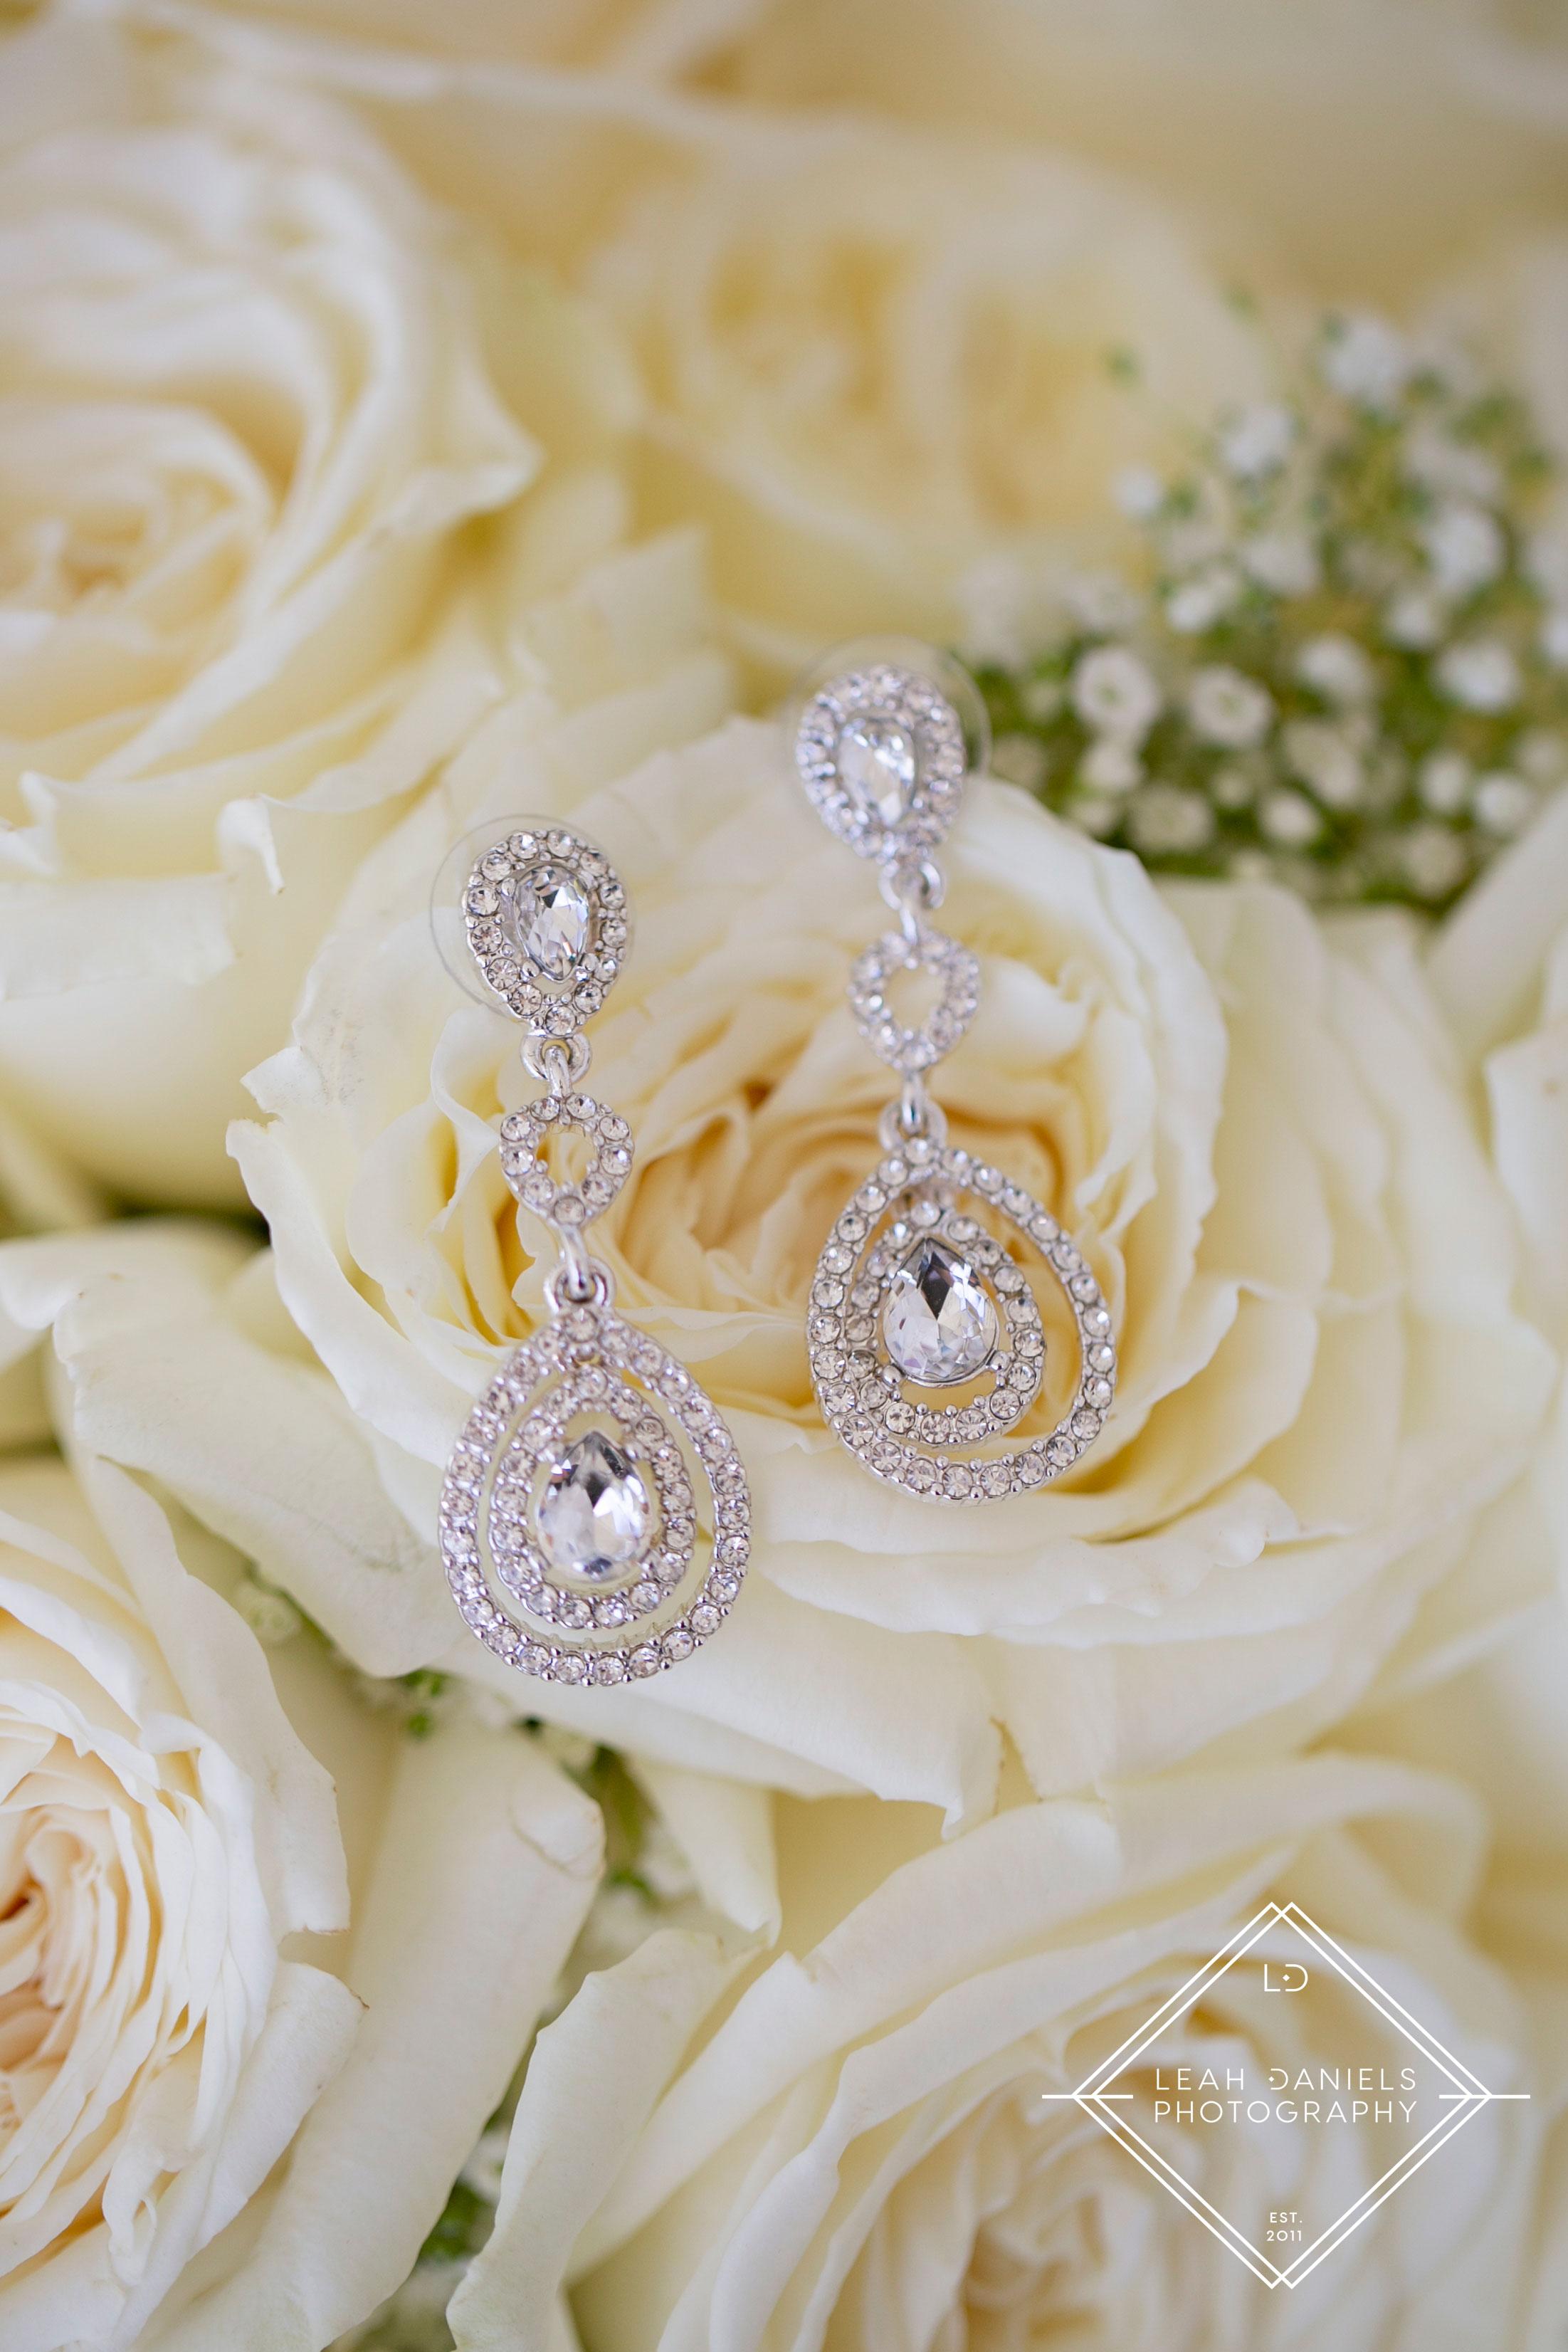 Scranton Wedding Photography - Jewelry Detail